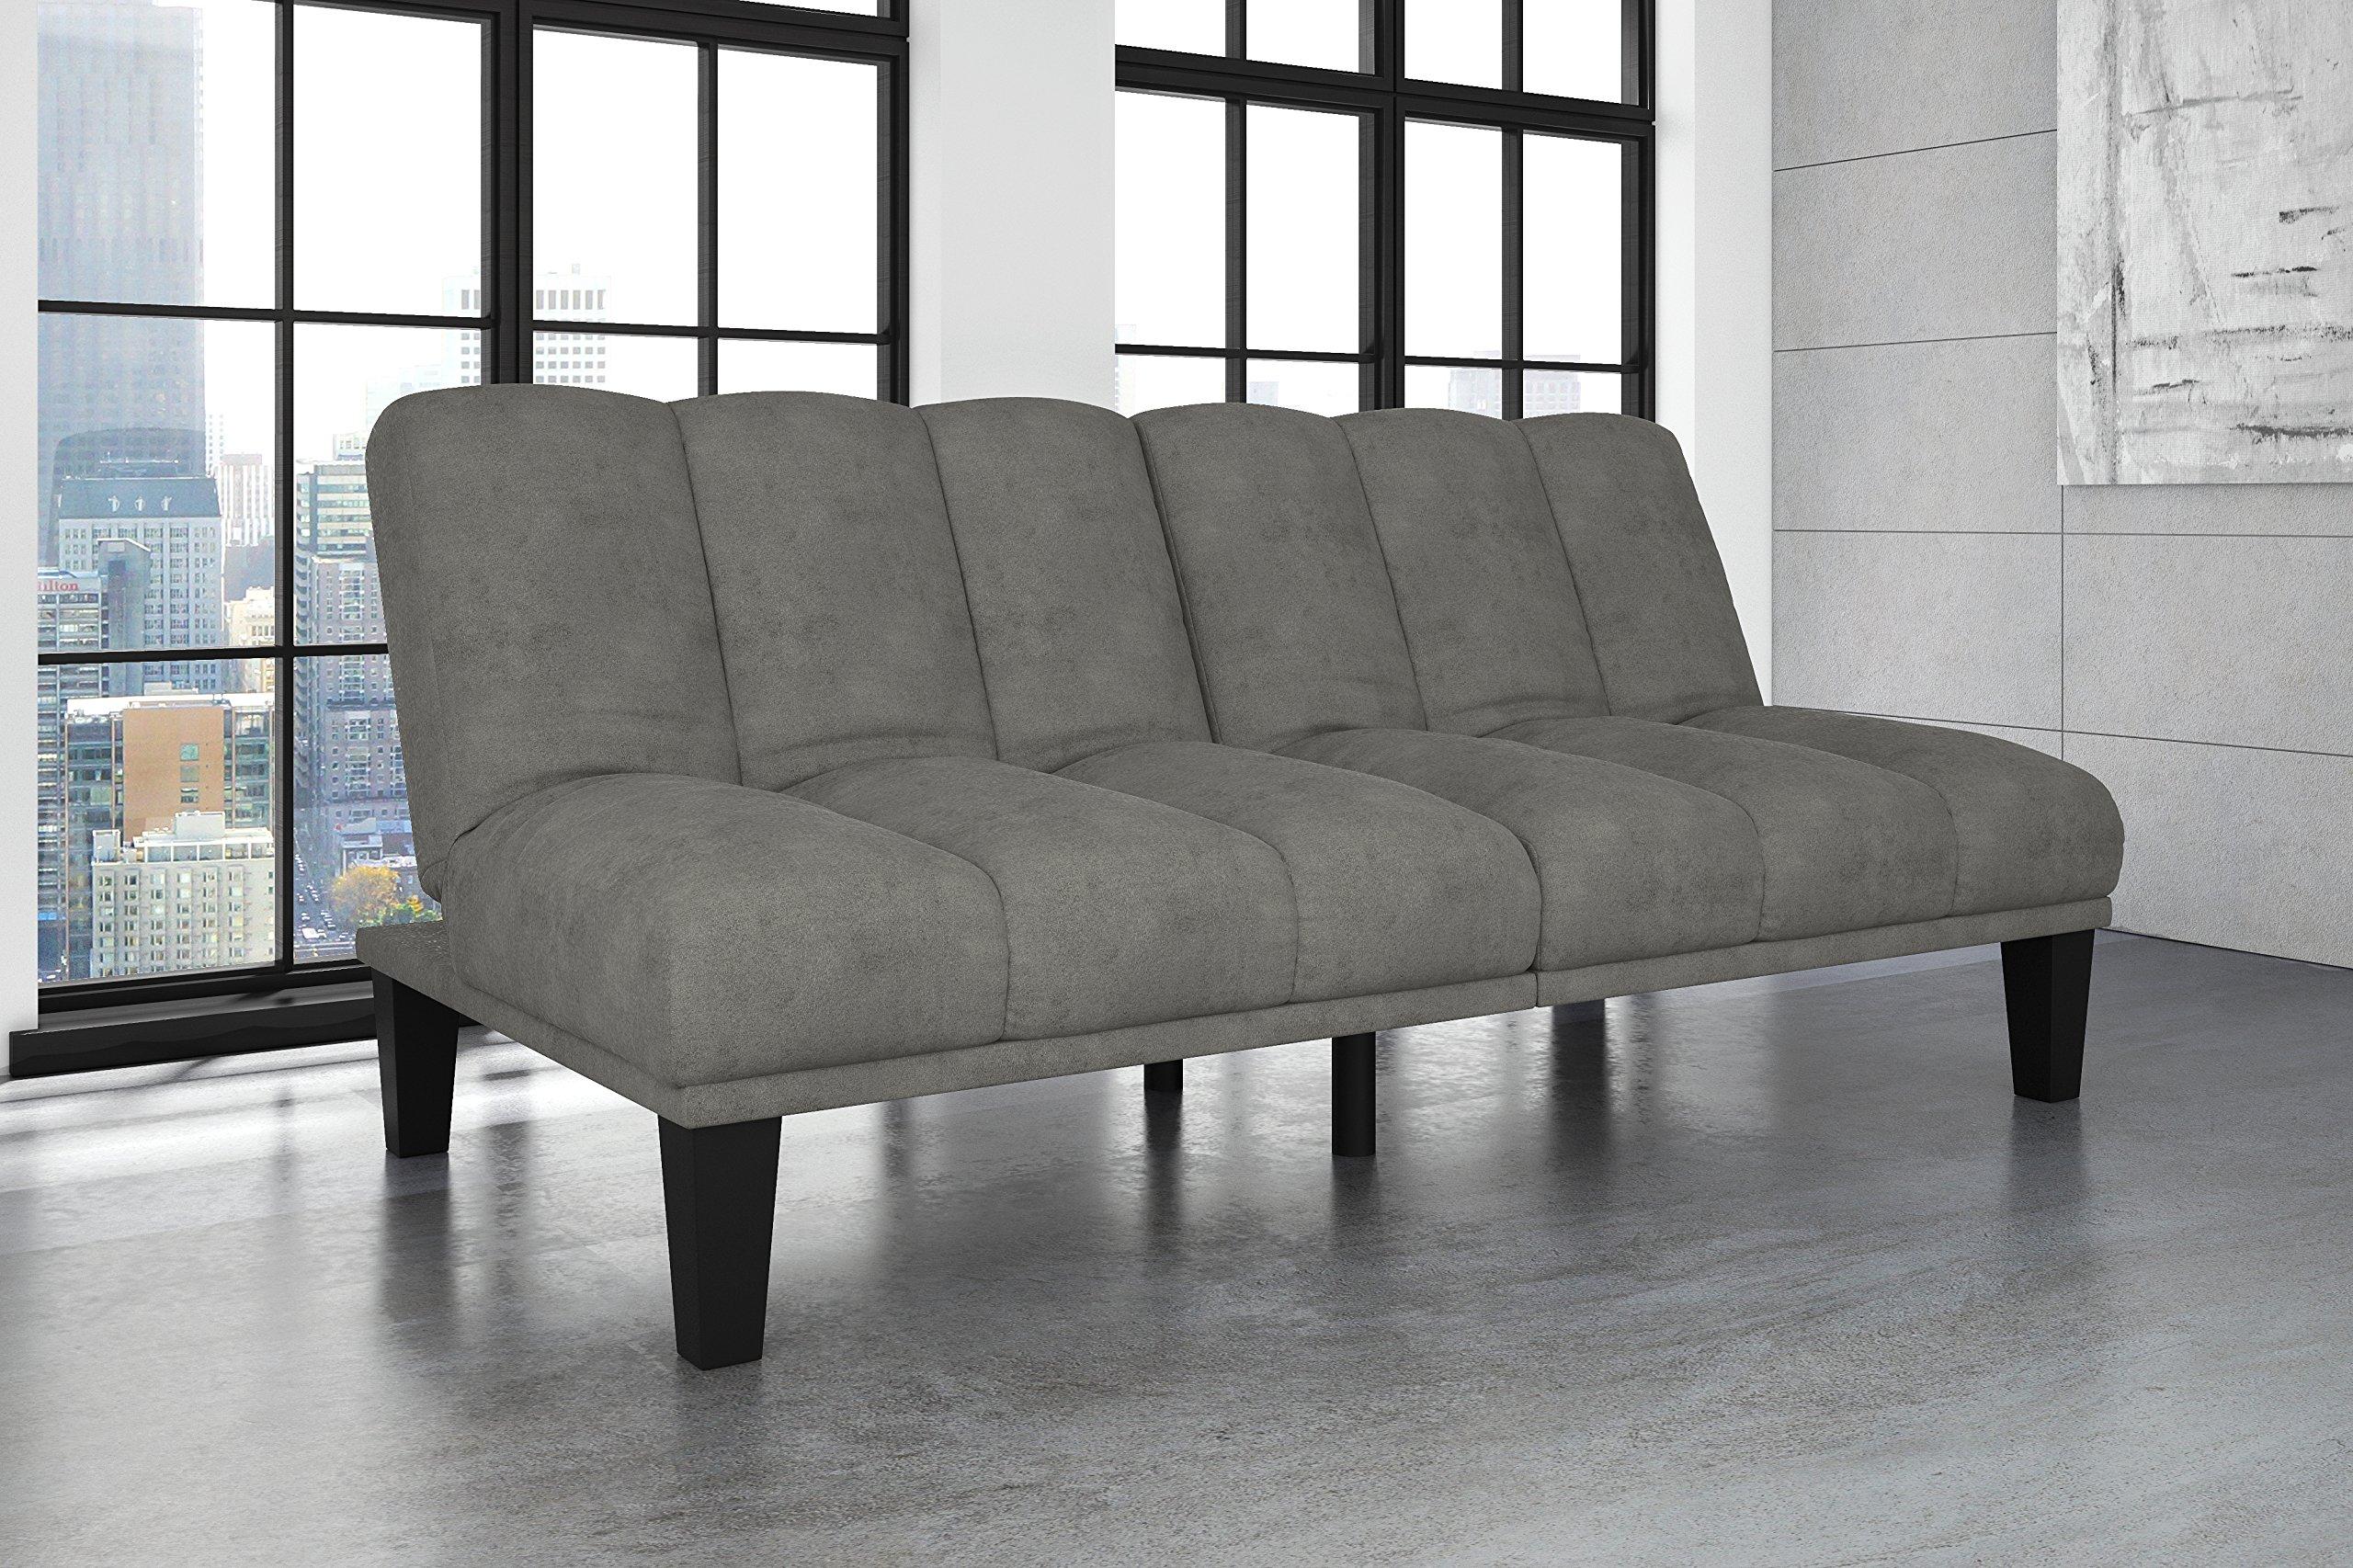 DHP Hamilton Estate Premium Sofa Futon Sleeper Comfortable Plush Upholstery, Rich Gray